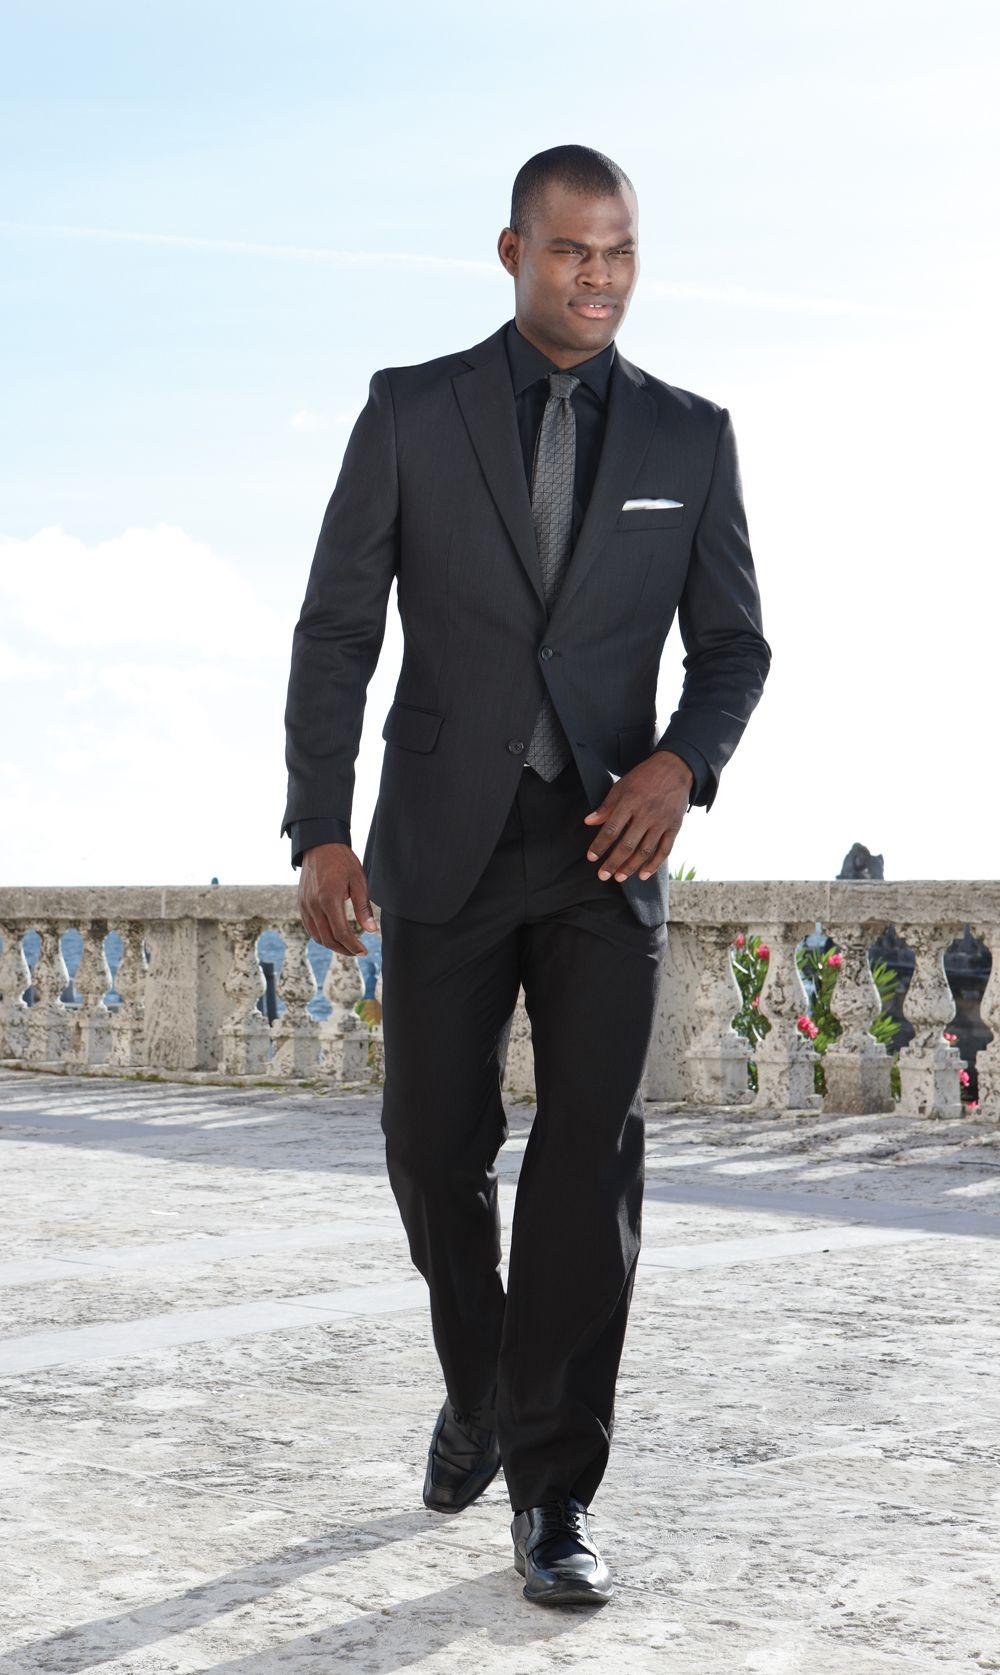 Mens Dress Suits, Clothing | Kohl's